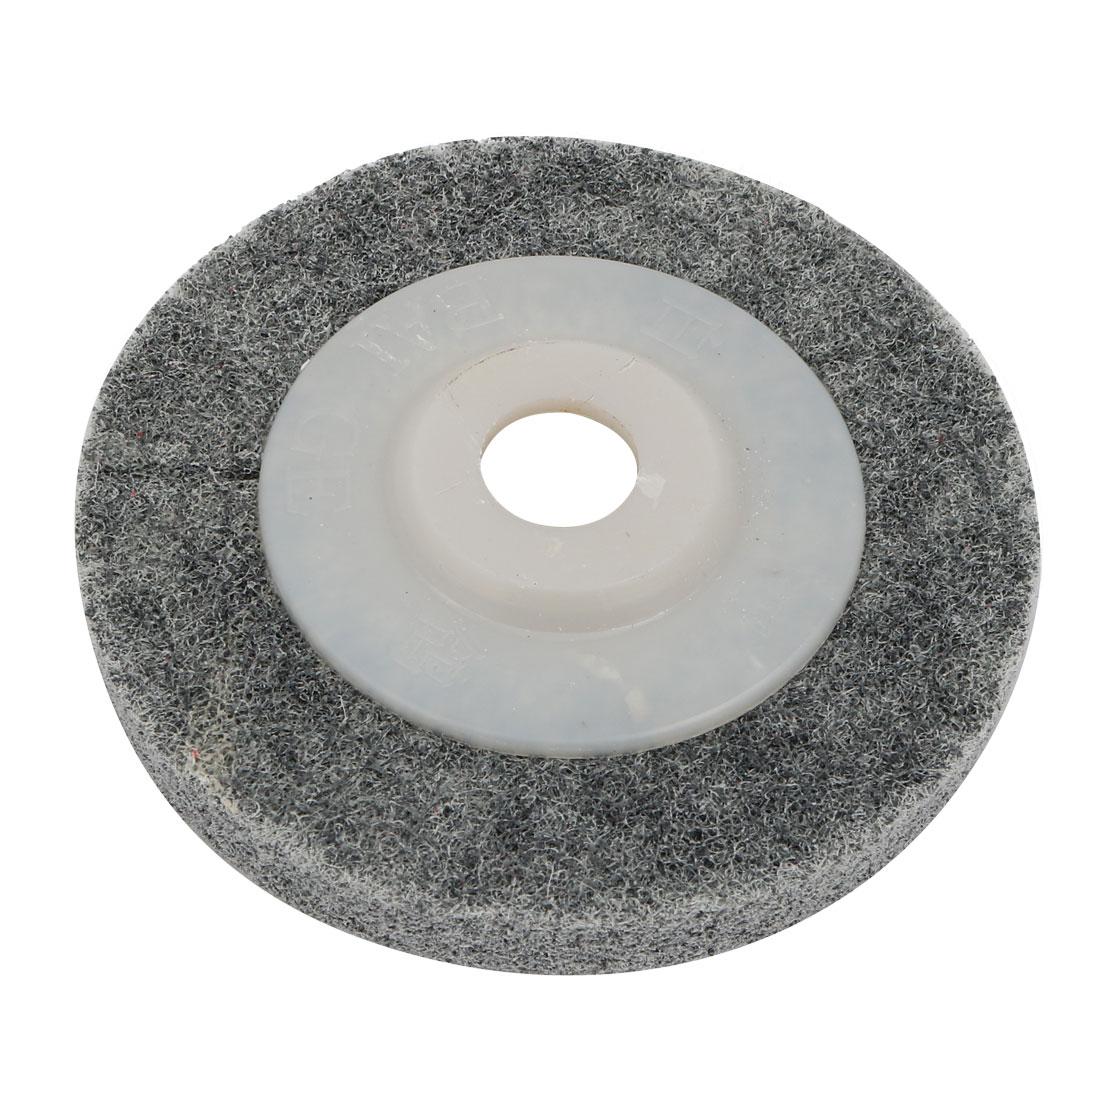 100mm Outer Dia Polishing Wheel Nylon Abrasive Buffing Disc Gray